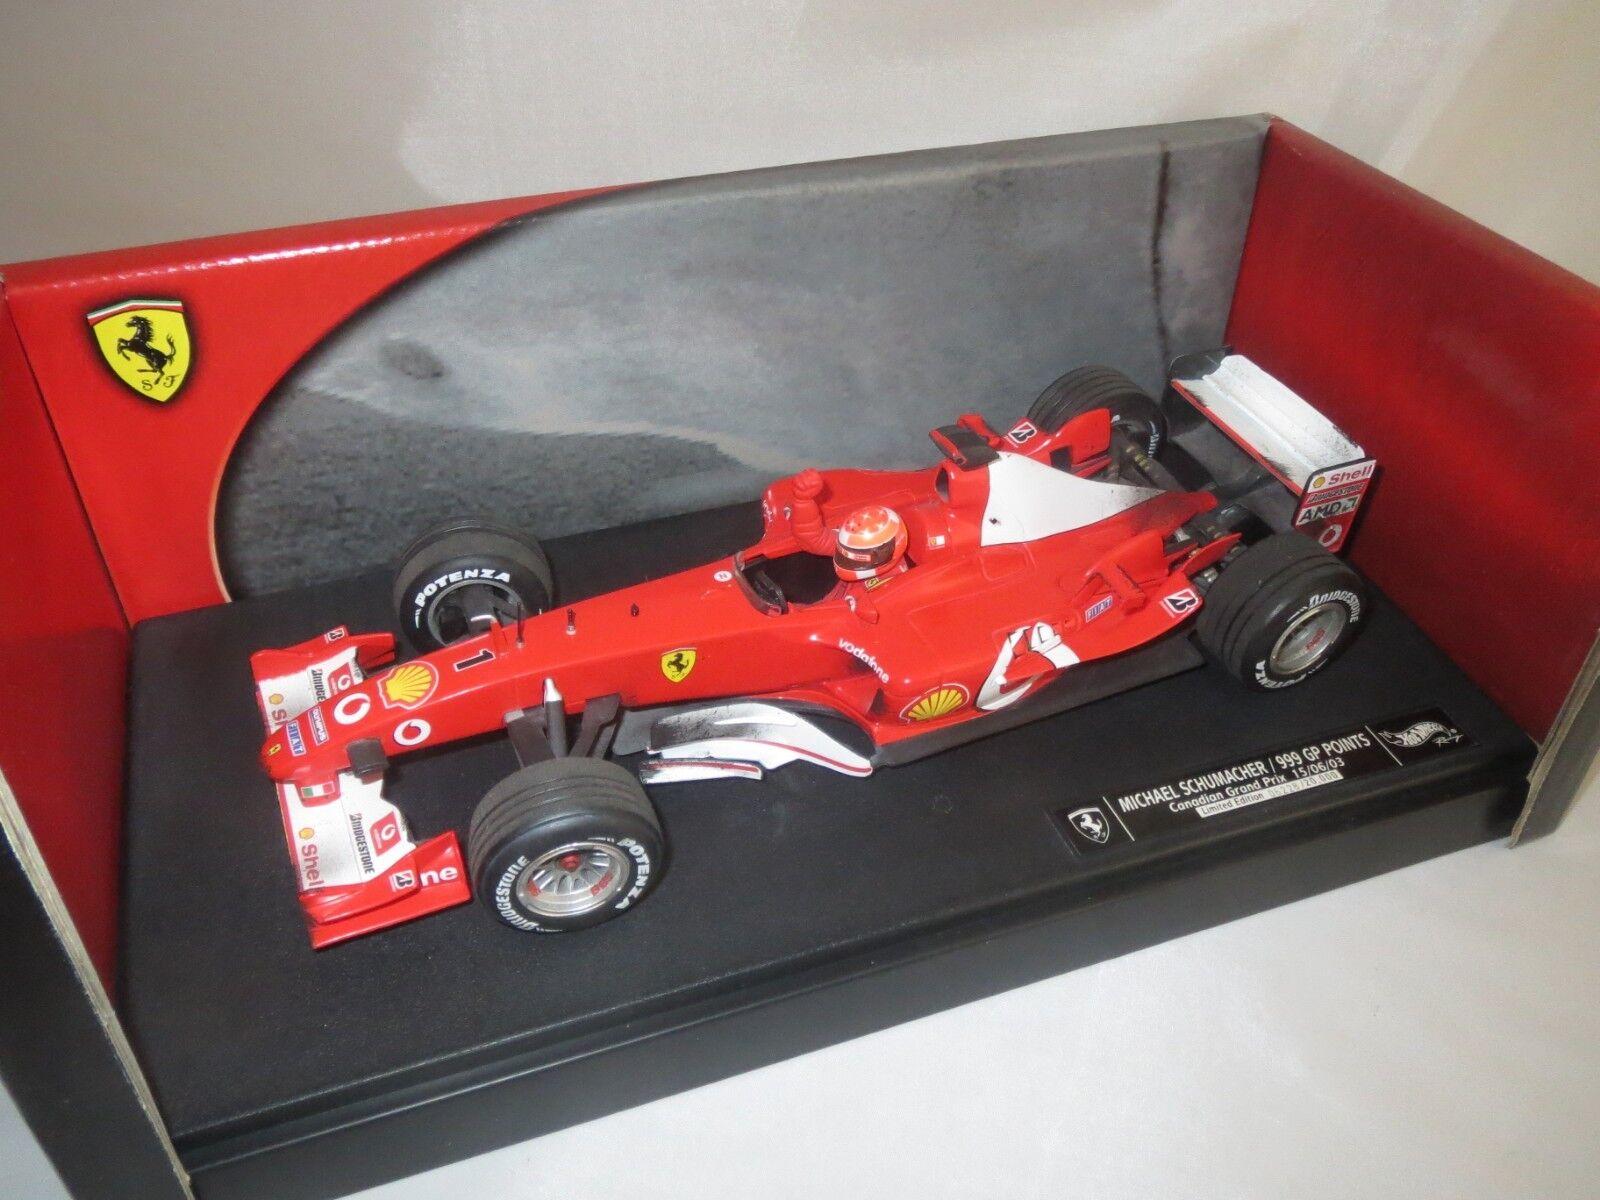 Mattel c5938  M. SCHUMACHER   1 (Canadian Grand Prix)  2003  1 18 neuf dans sa boîte (f5)